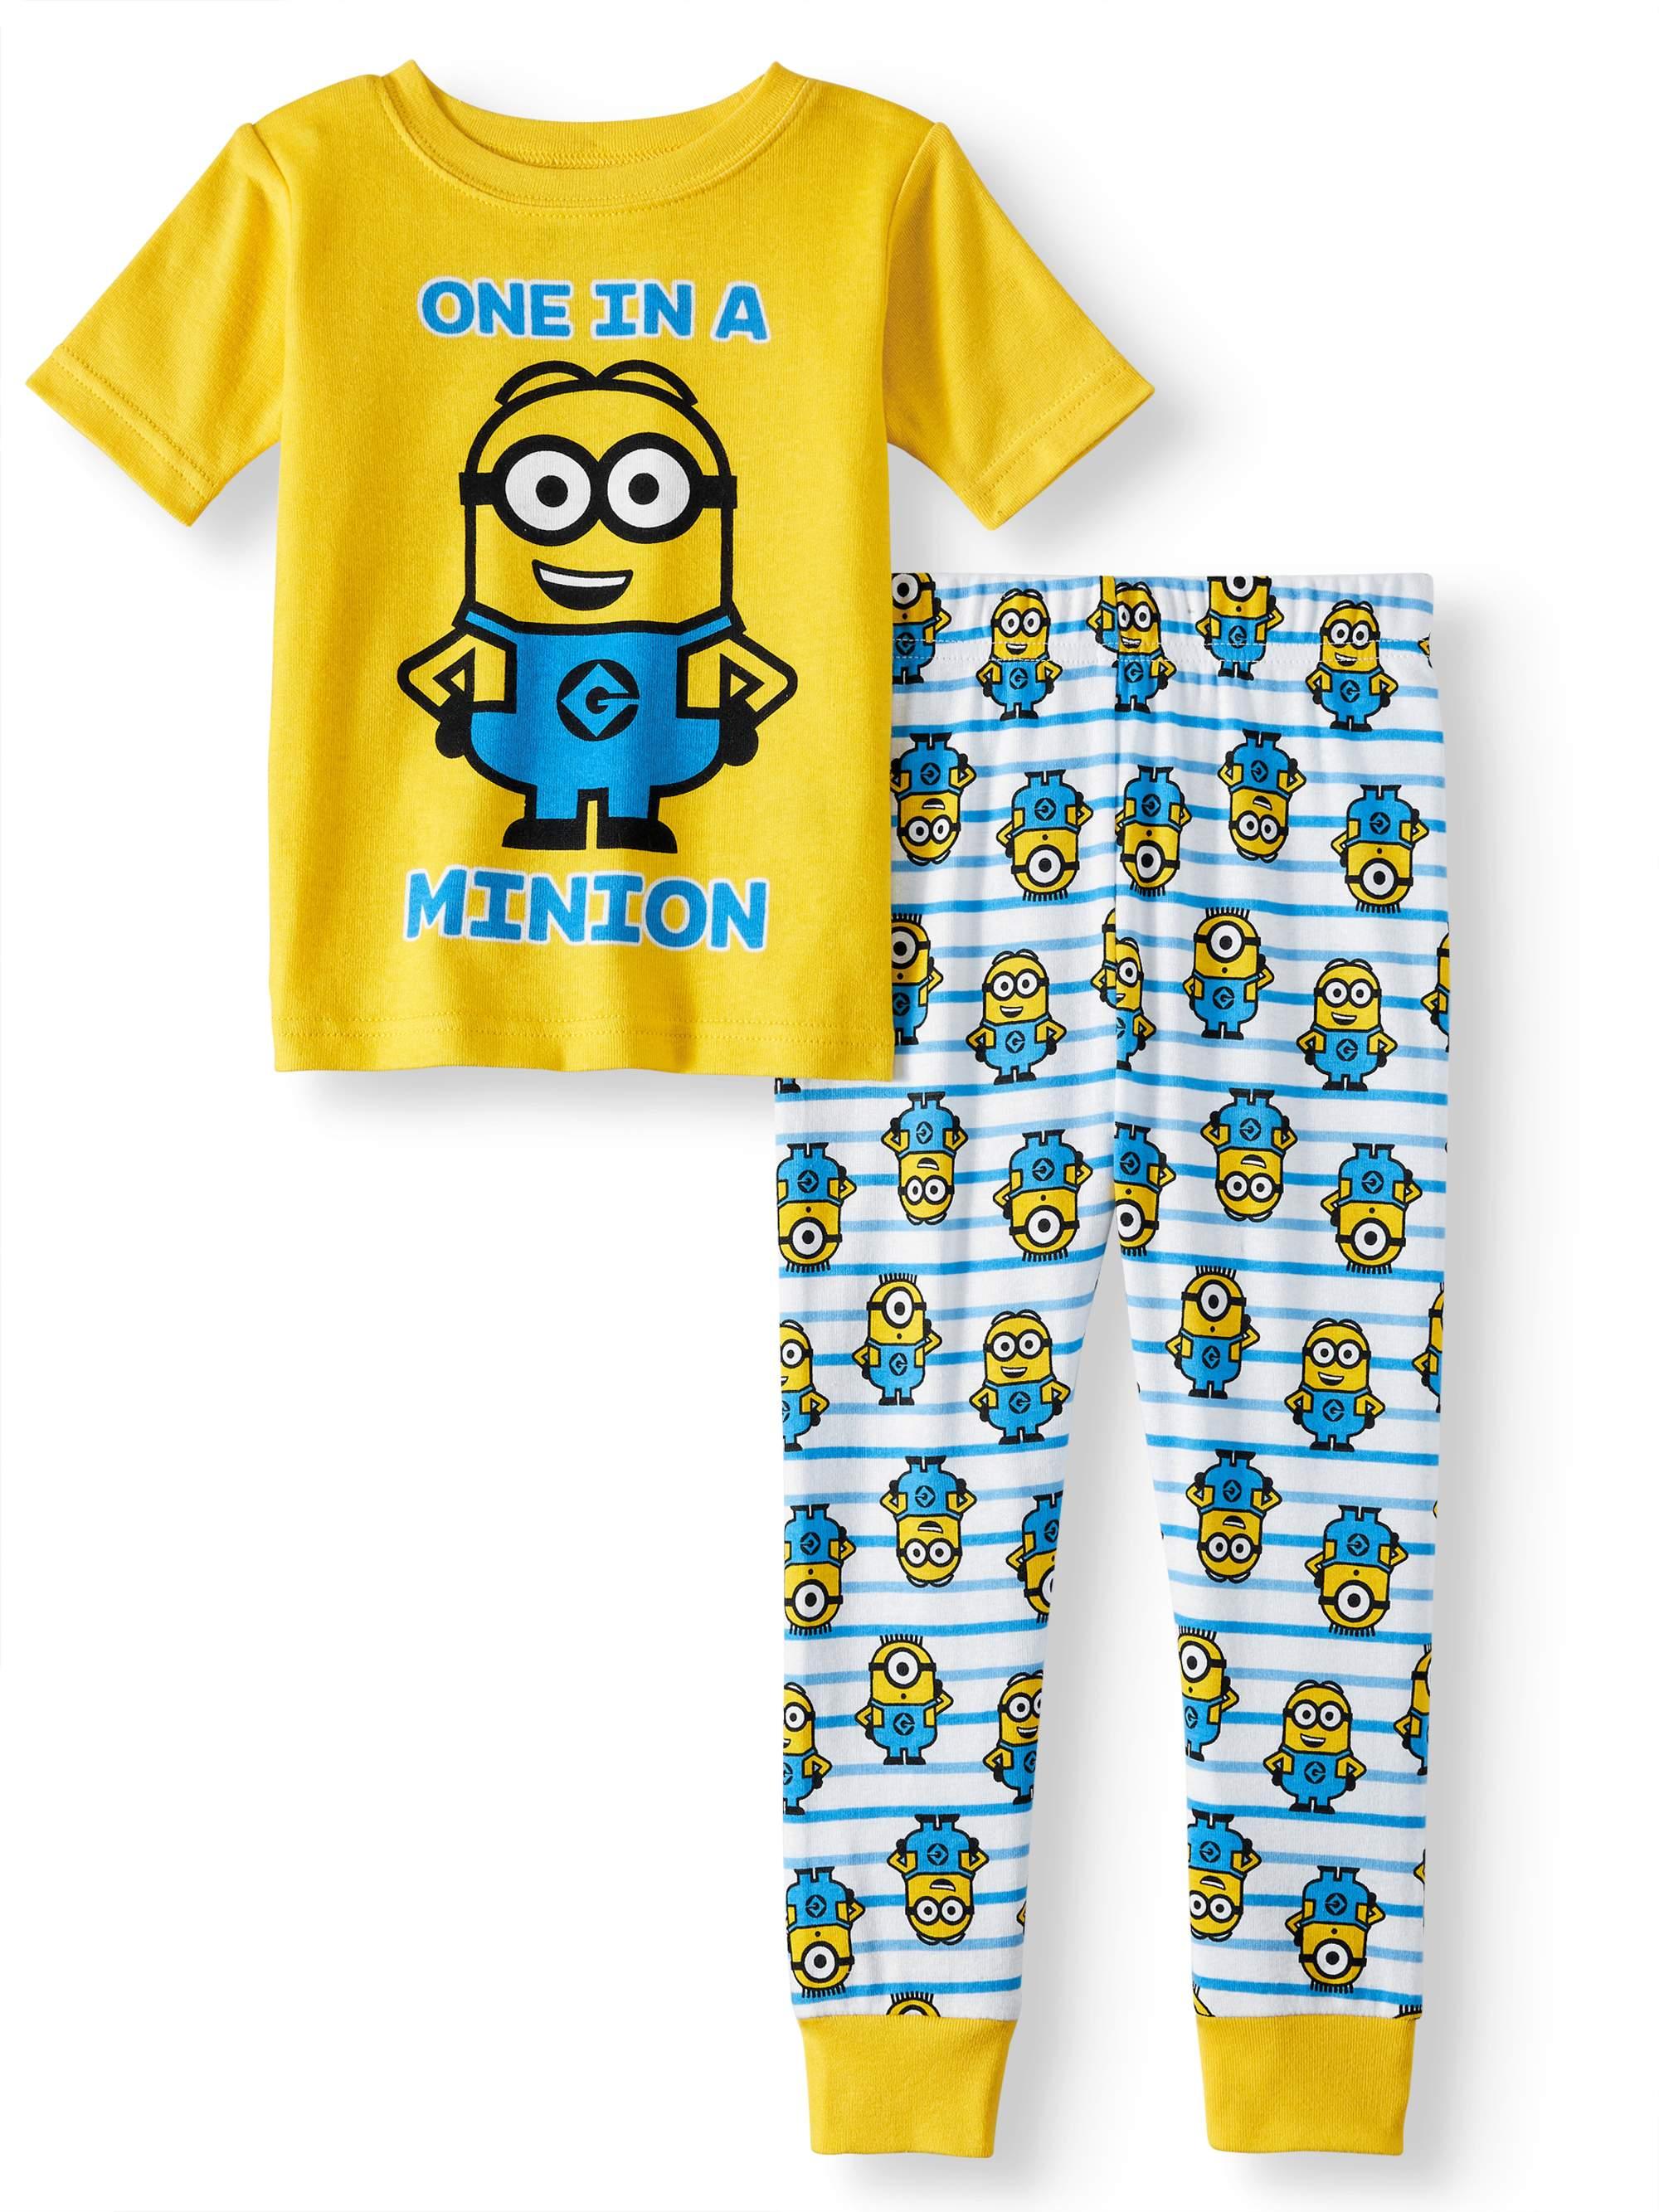 Cotton Tight Fit Pajamas, 2pc Set (Toddler Boys)